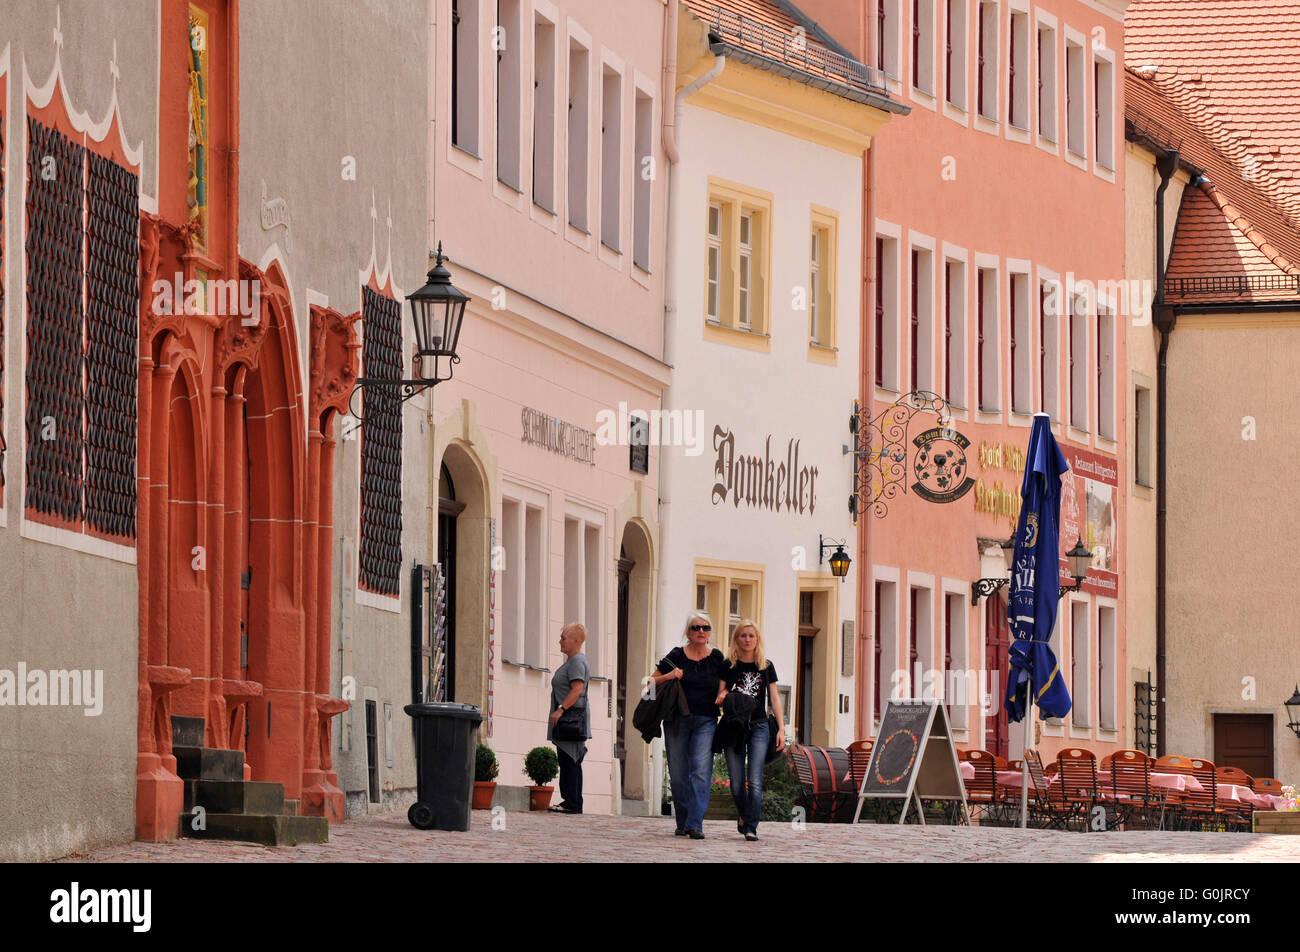 Domherrenhauser, Domplatz, Altstadt, Meißen, Sachsen, Deutschland / Domherrenhäuser, Dekanat Residenz, Stockbild